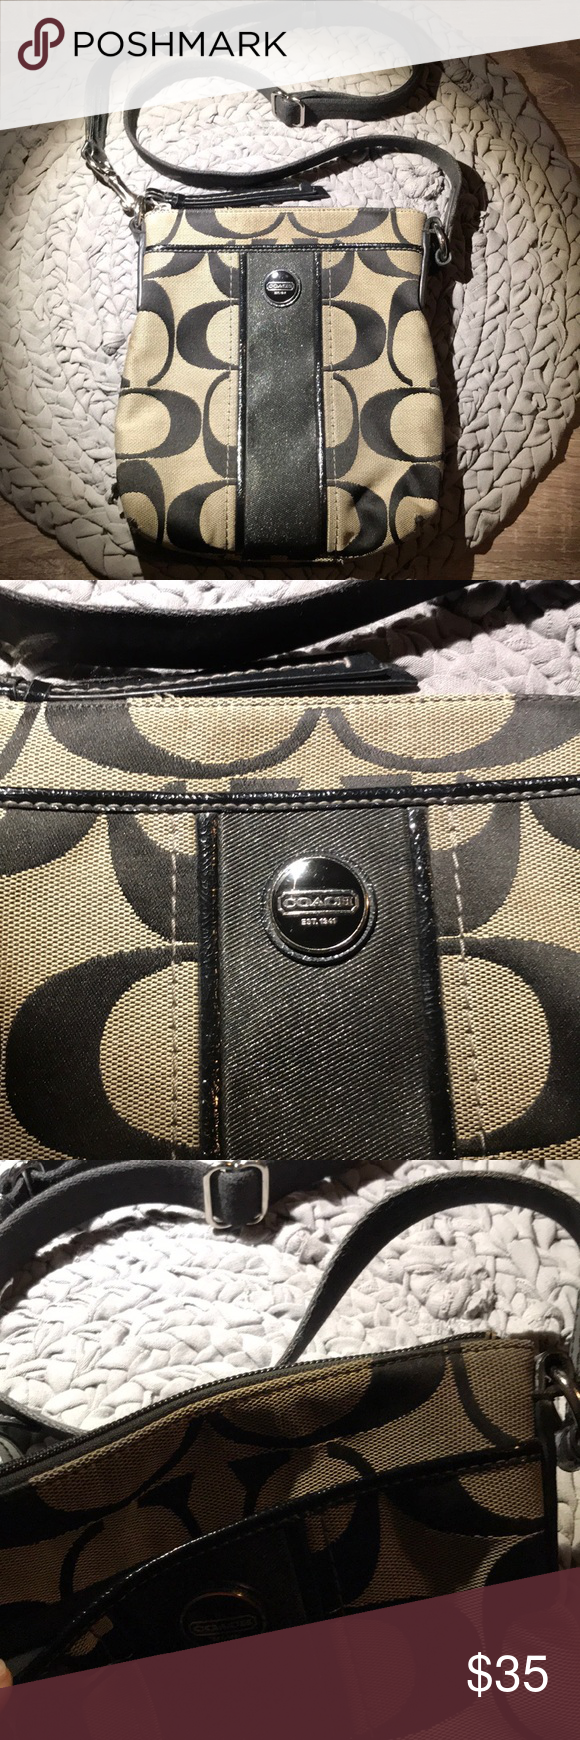 COACH crossbody bag Preloved coach crossbody bag This item